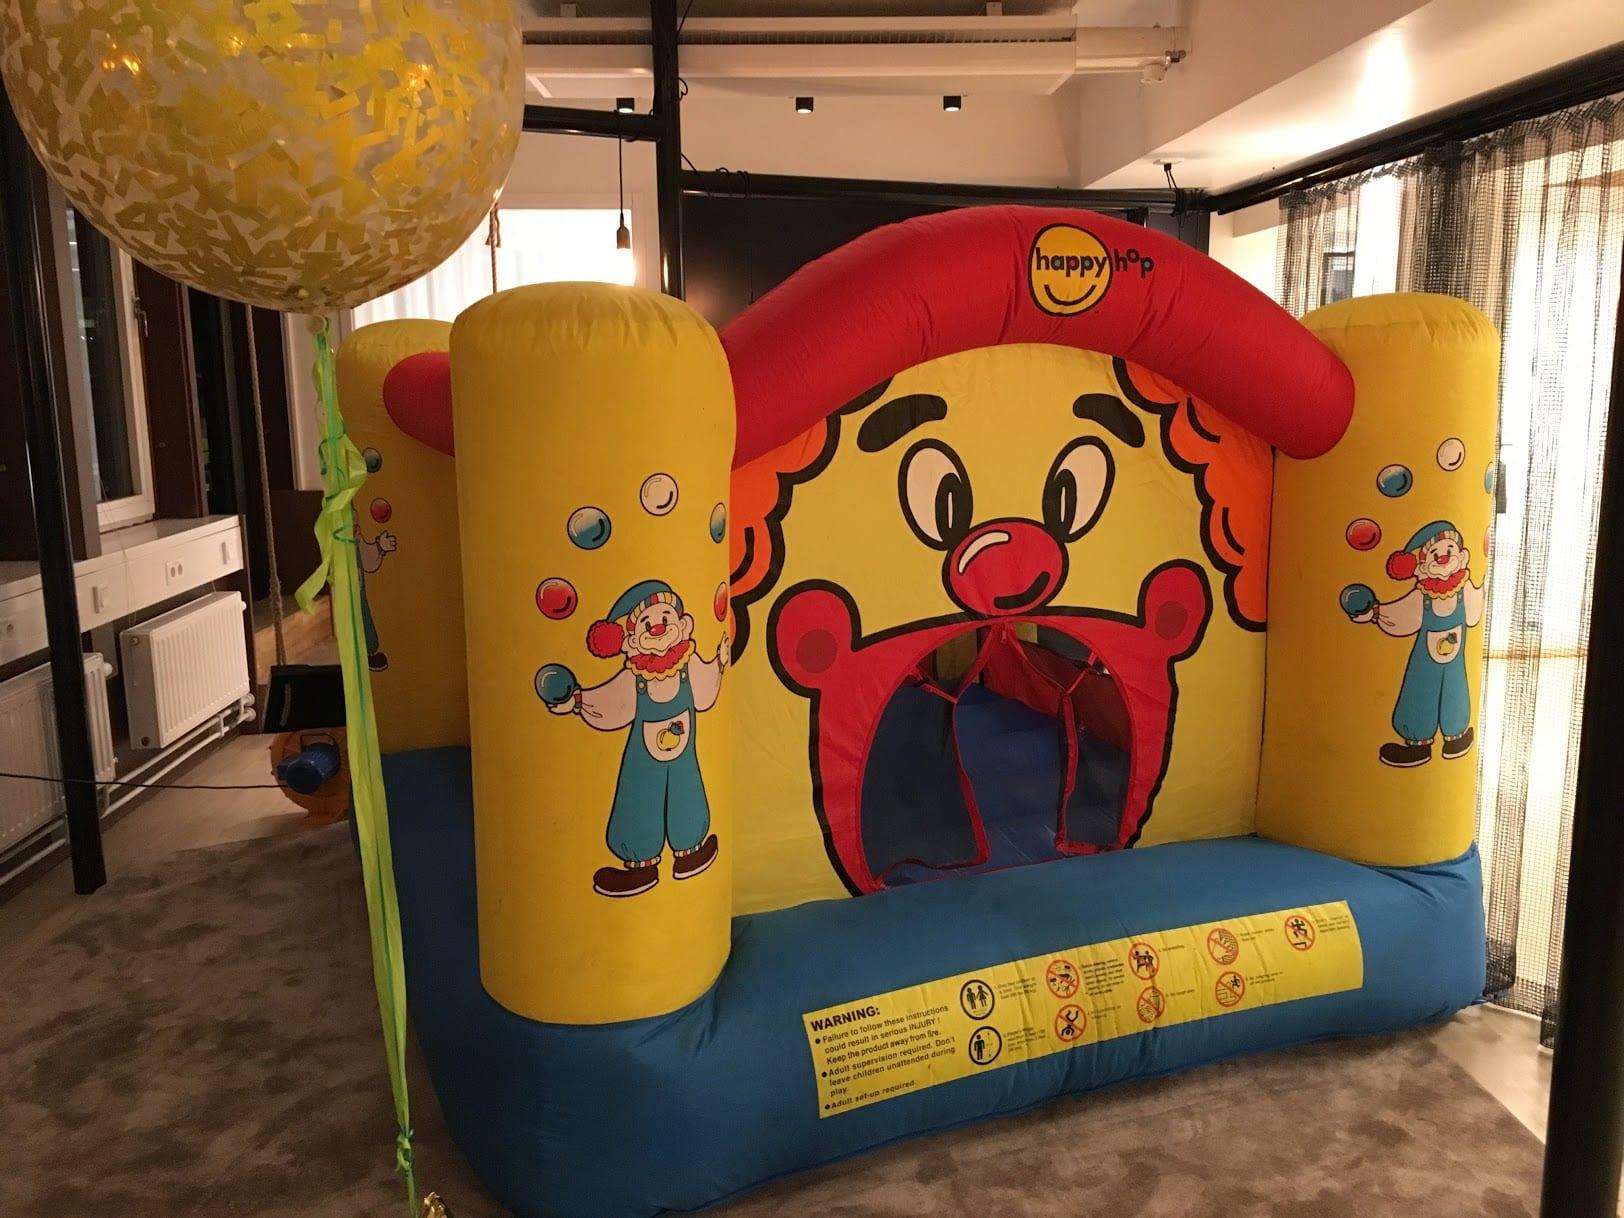 Hyra-liten-hoppborg-clown